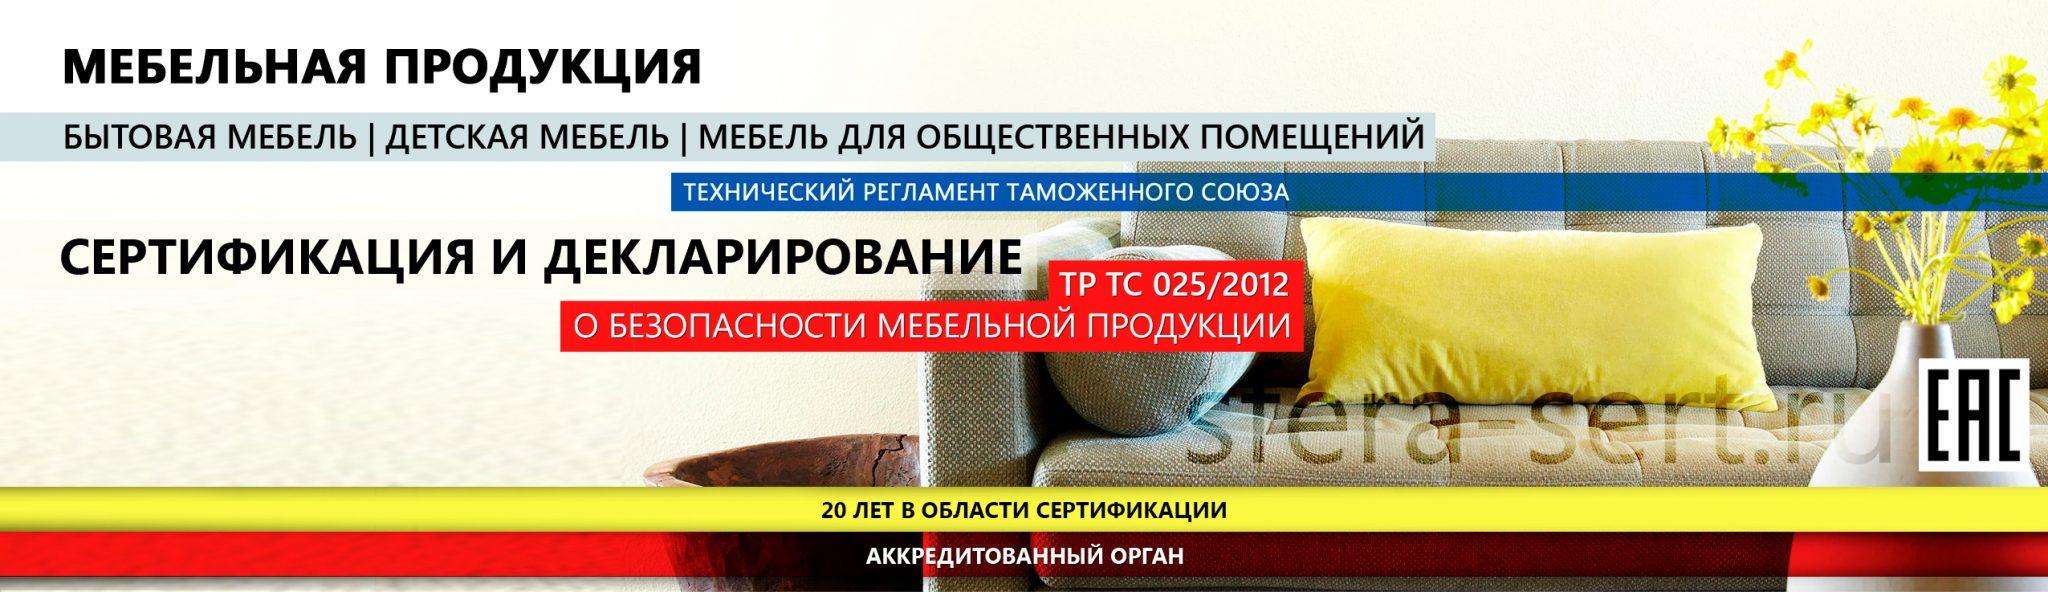 Сертификация мебели баннер